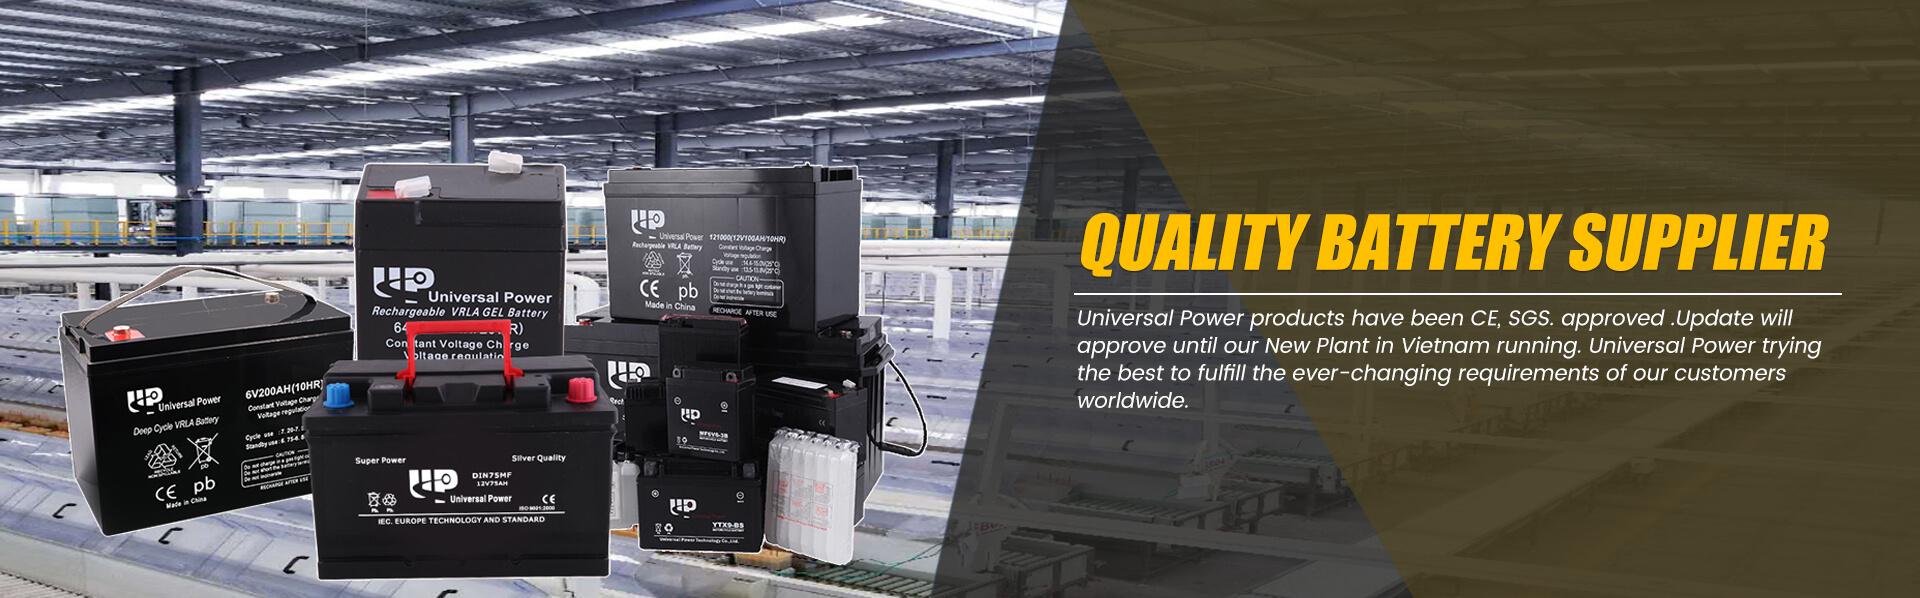 Quality Battery Suppleir China Banner 03